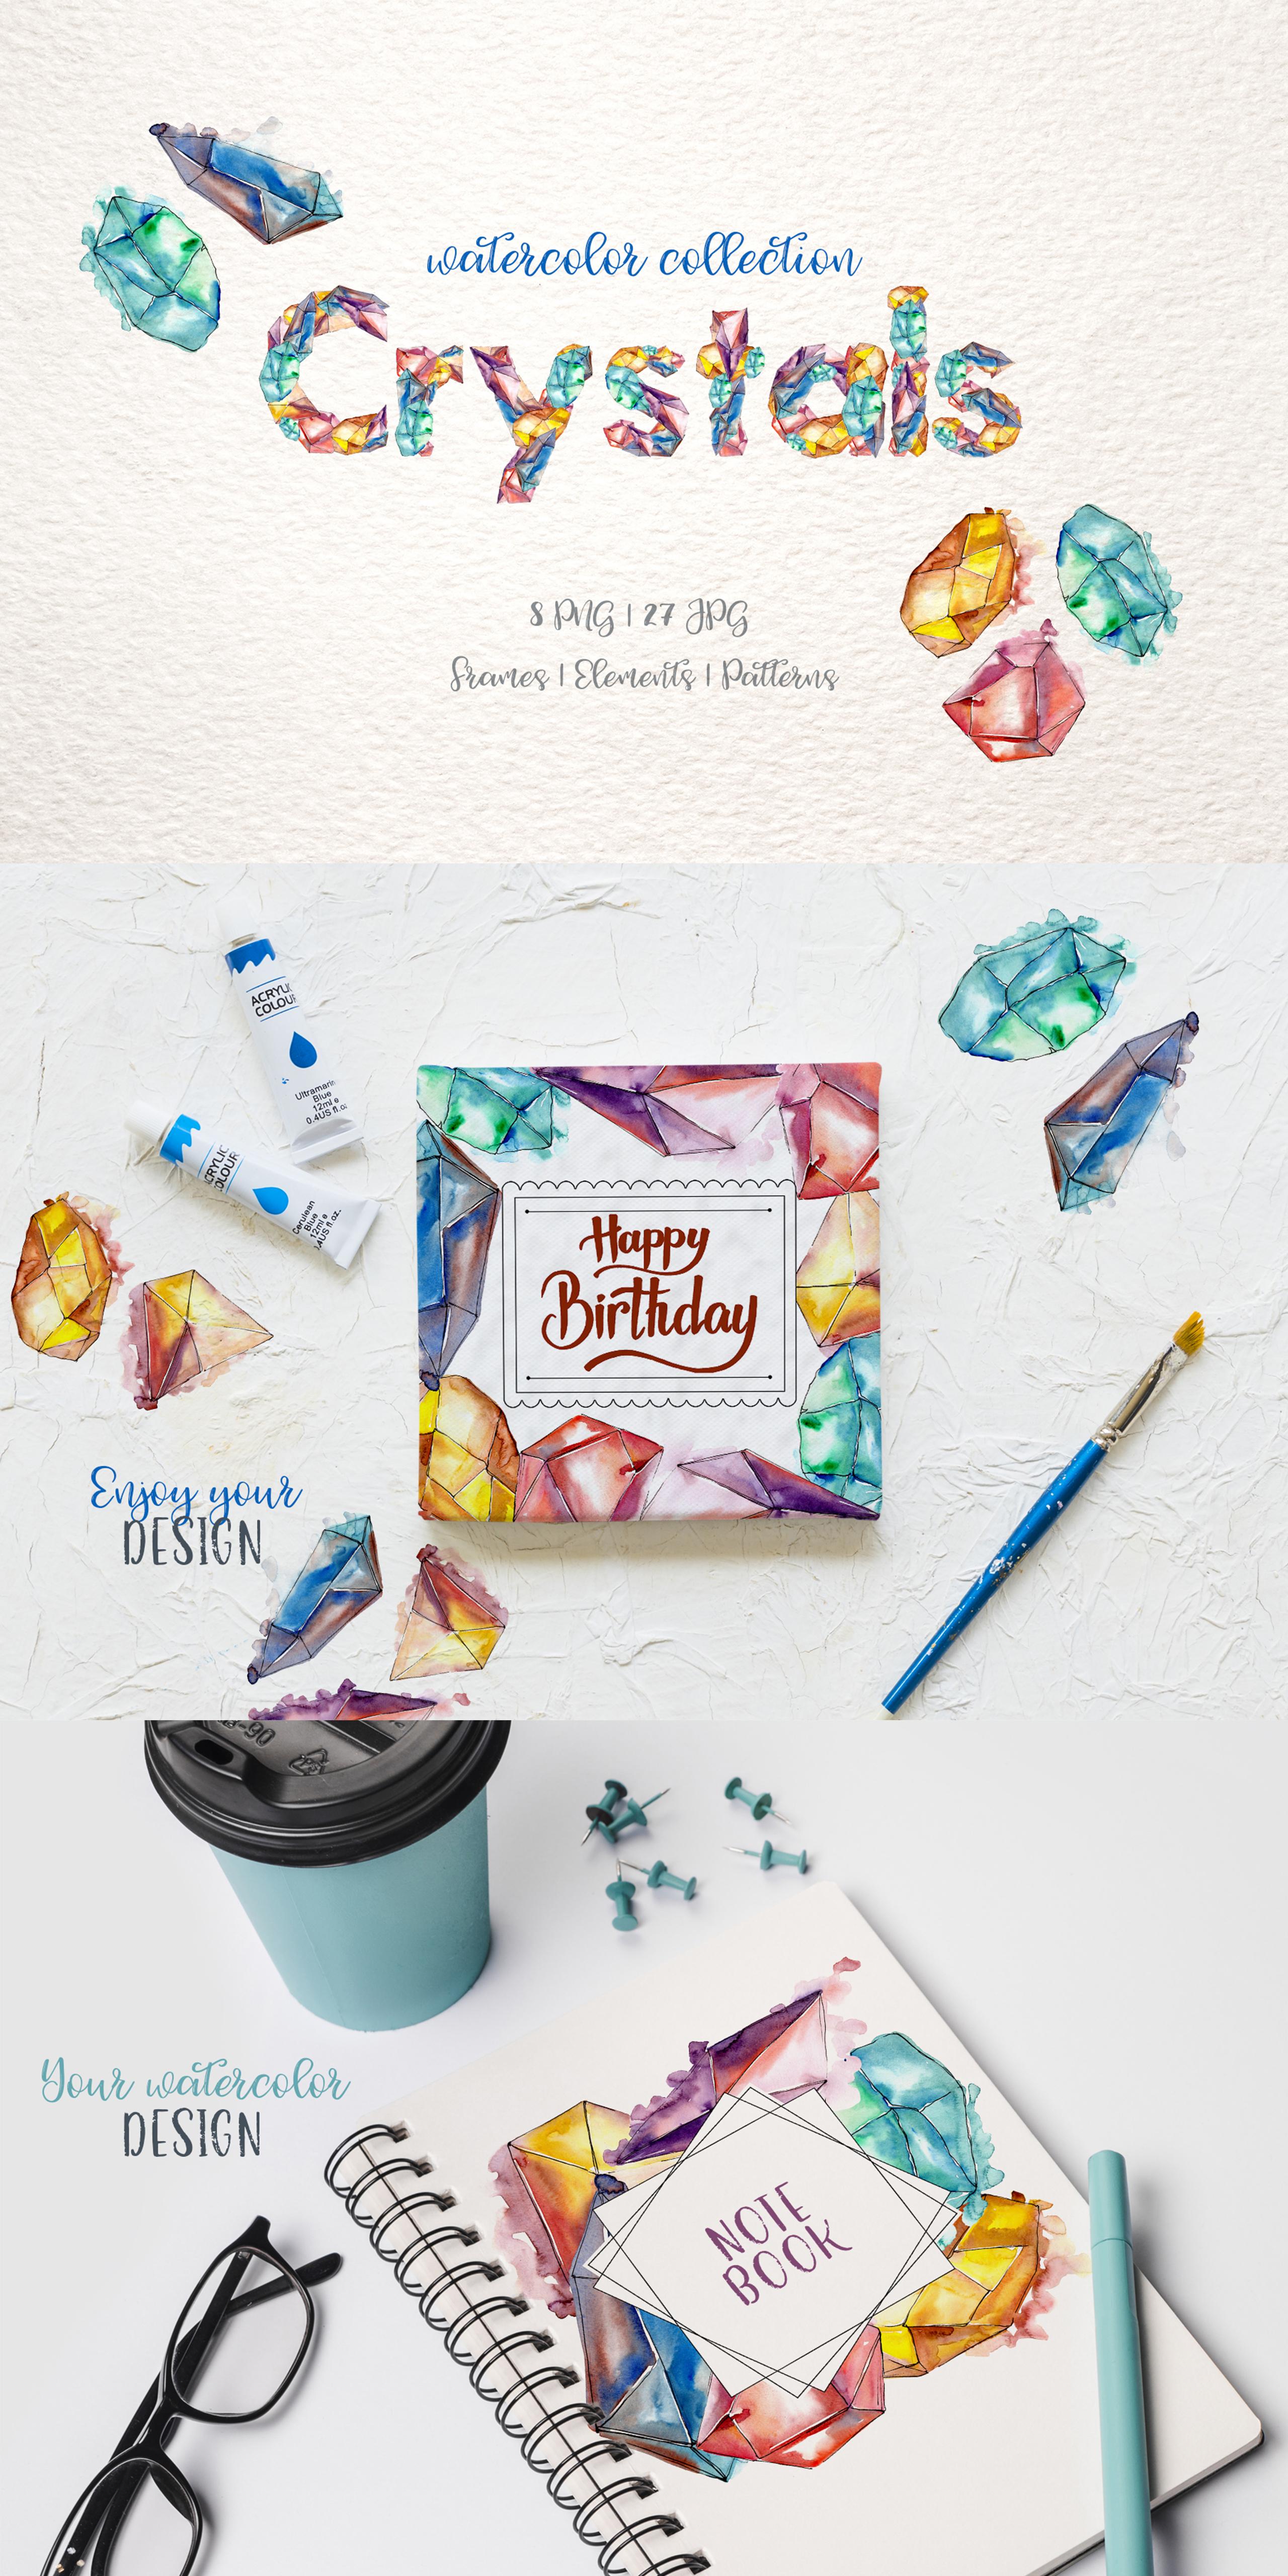 Crystals Watercolor Lilac Сolor png Illustrations